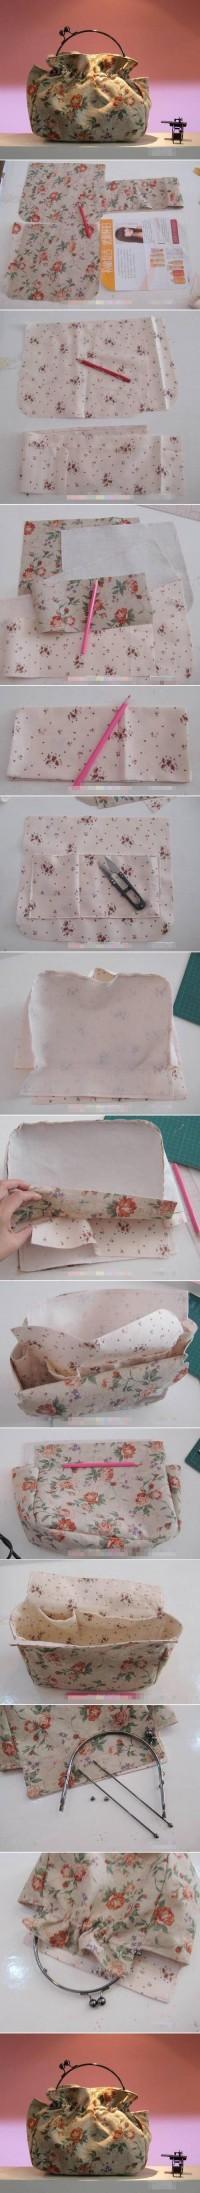 DIY Simple Handmade Handbag DIY Projects | UsefulDIY.com